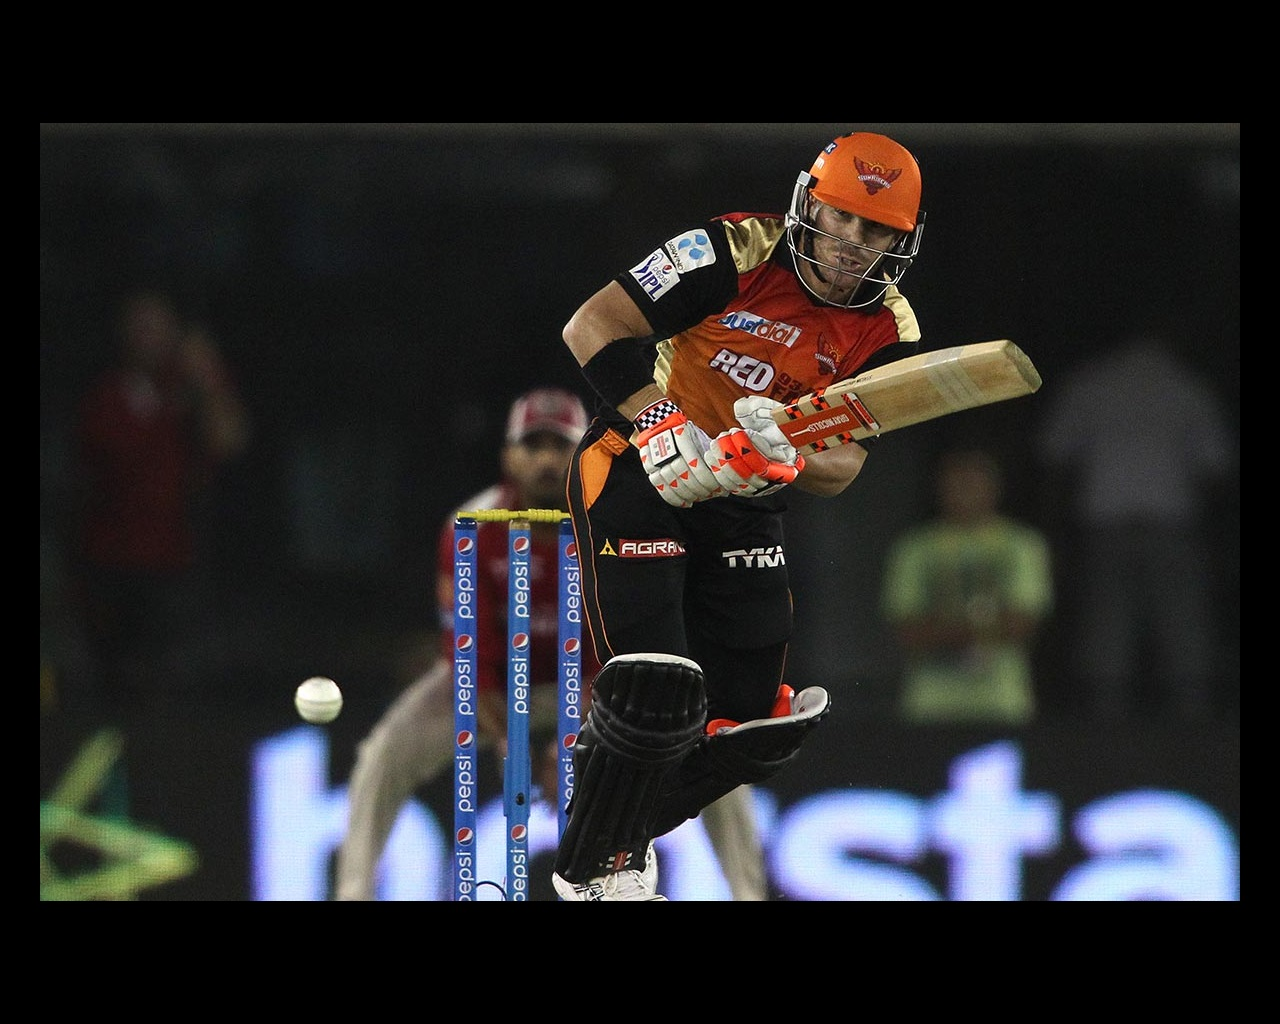 Warner, Boult guide Sunrisers to win | cricket com au